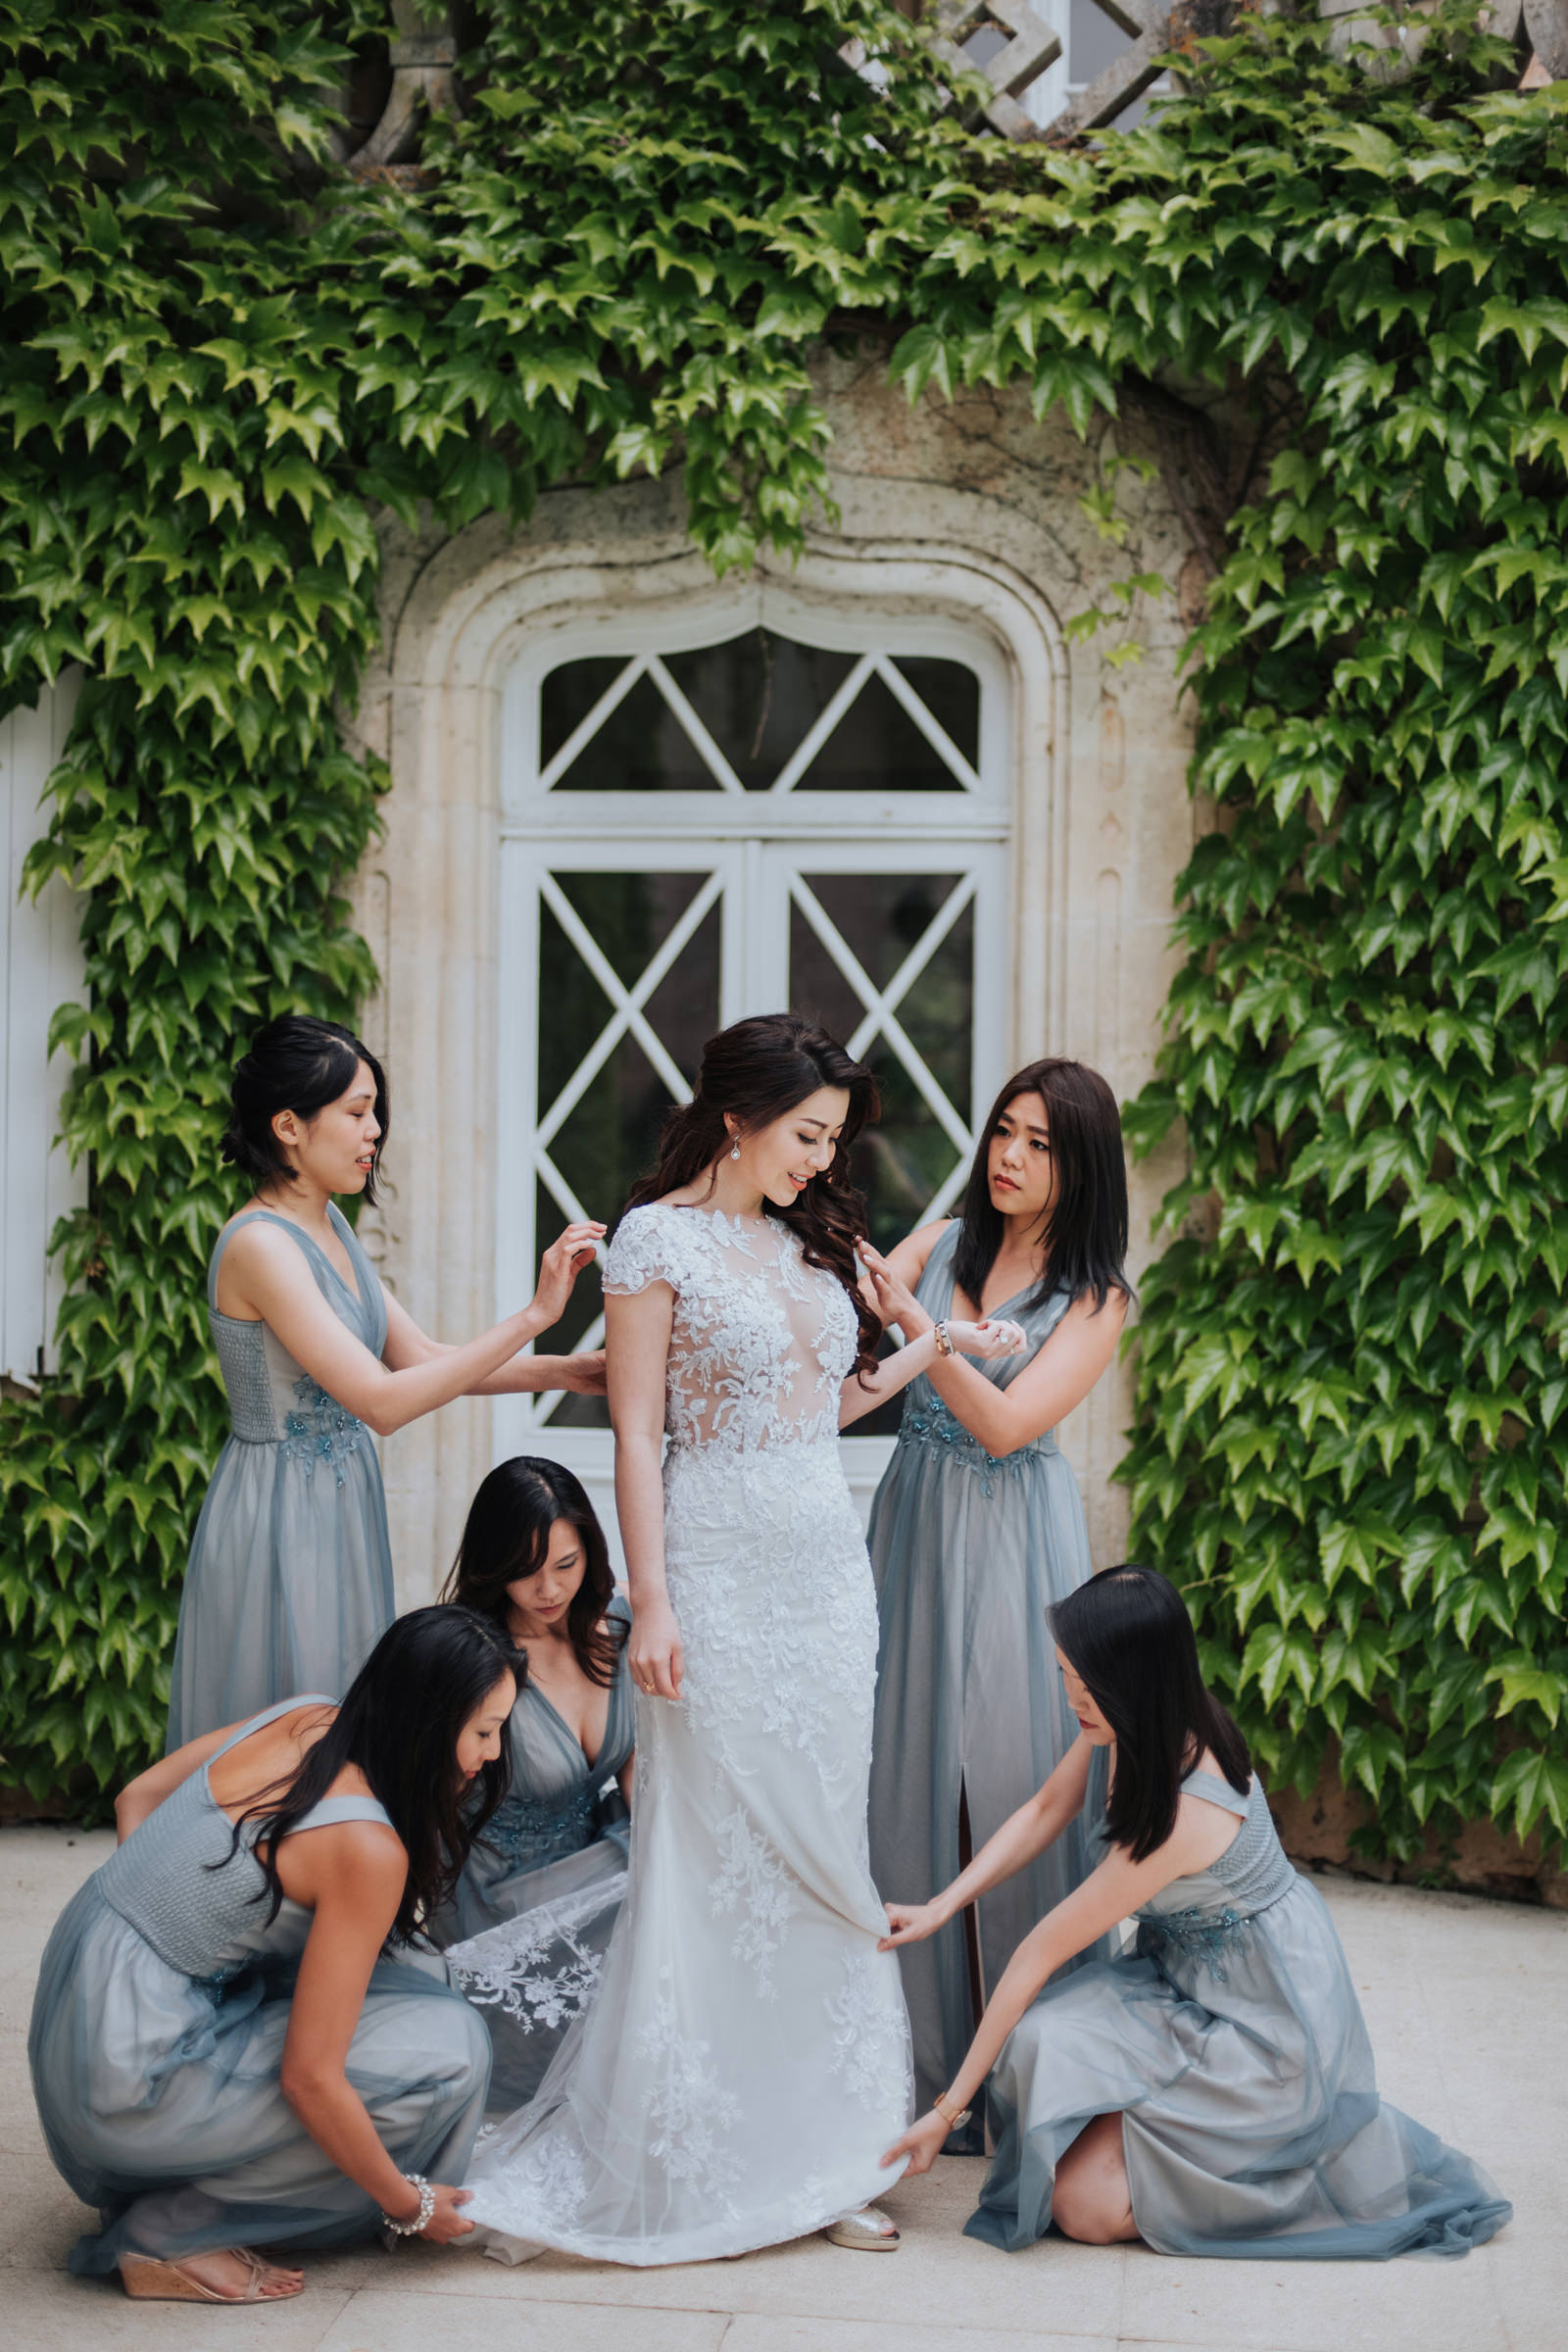 Dusty blue chiffon wedding gowns for bridesmaids - MunKeat Studios - Malaysia